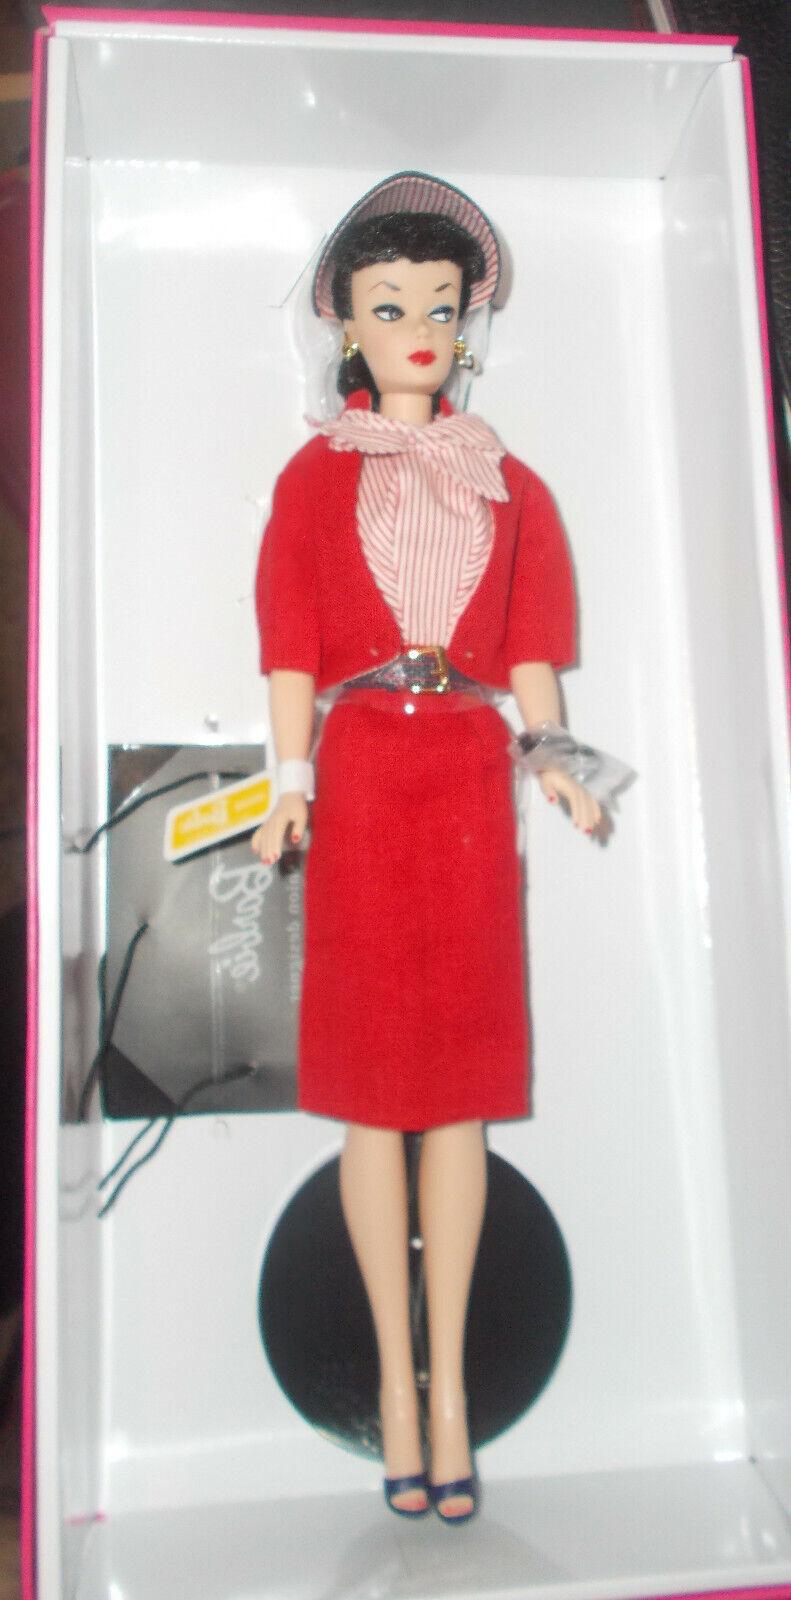 Barbie firma's Barbie ocupado Gal - 2019-Vintage Repro -- FXF26-Envío Gratis